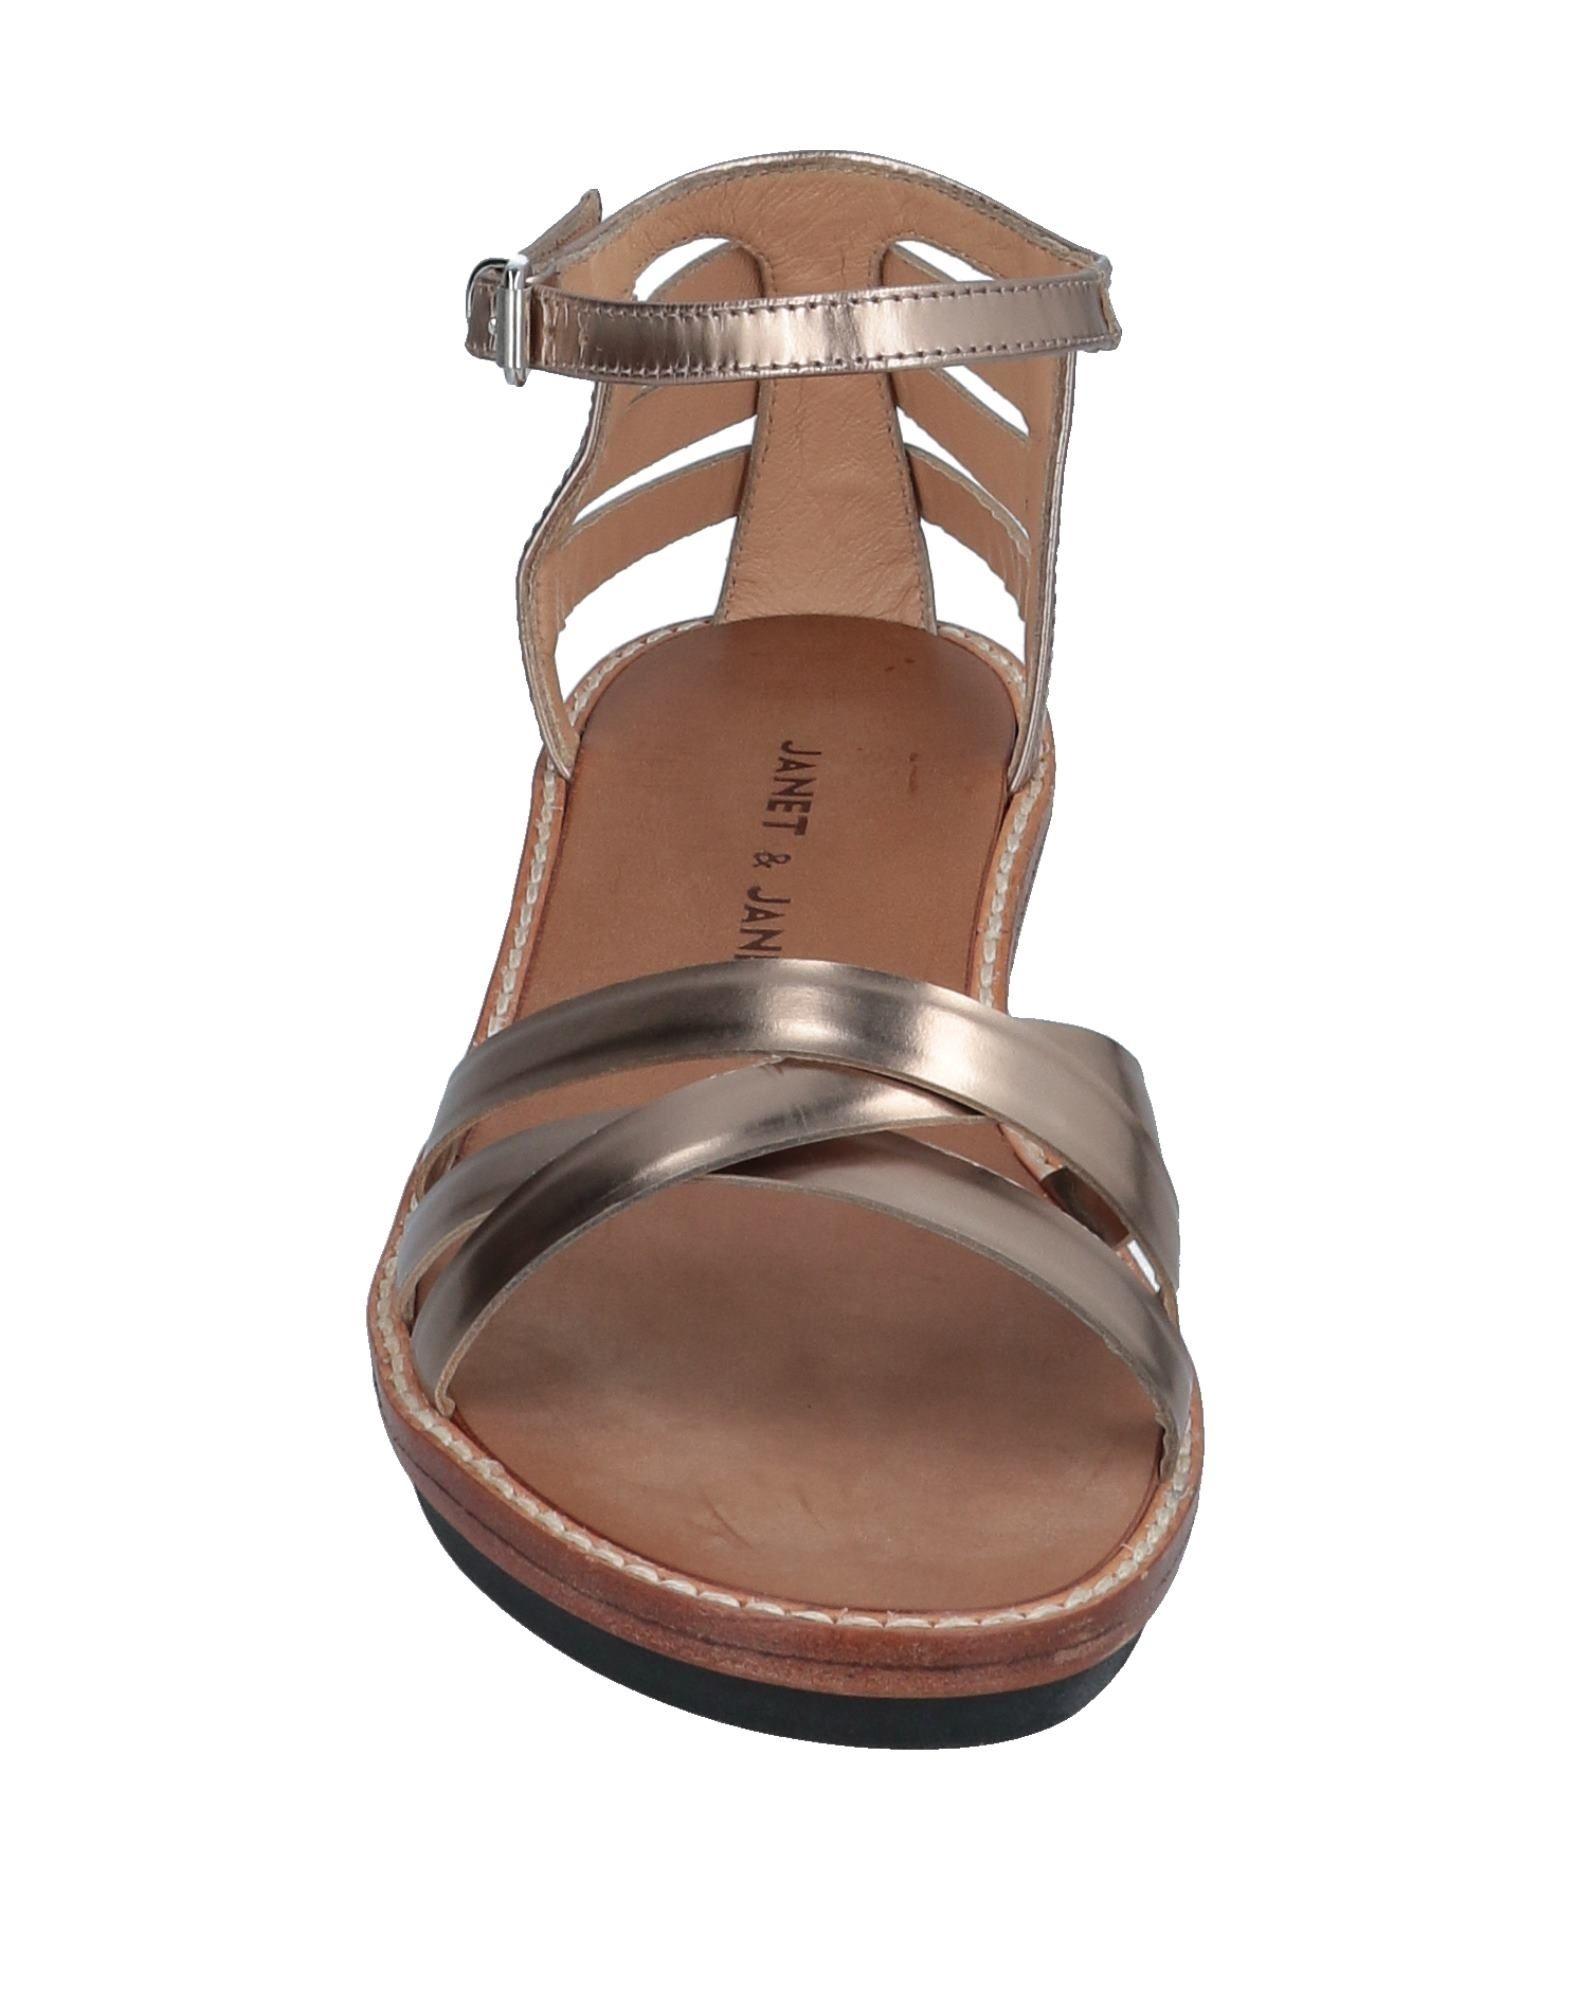 Janet & Janet Sandalen  Damen  Sandalen 11182760IE Gute Qualität beliebte Schuhe 634db3